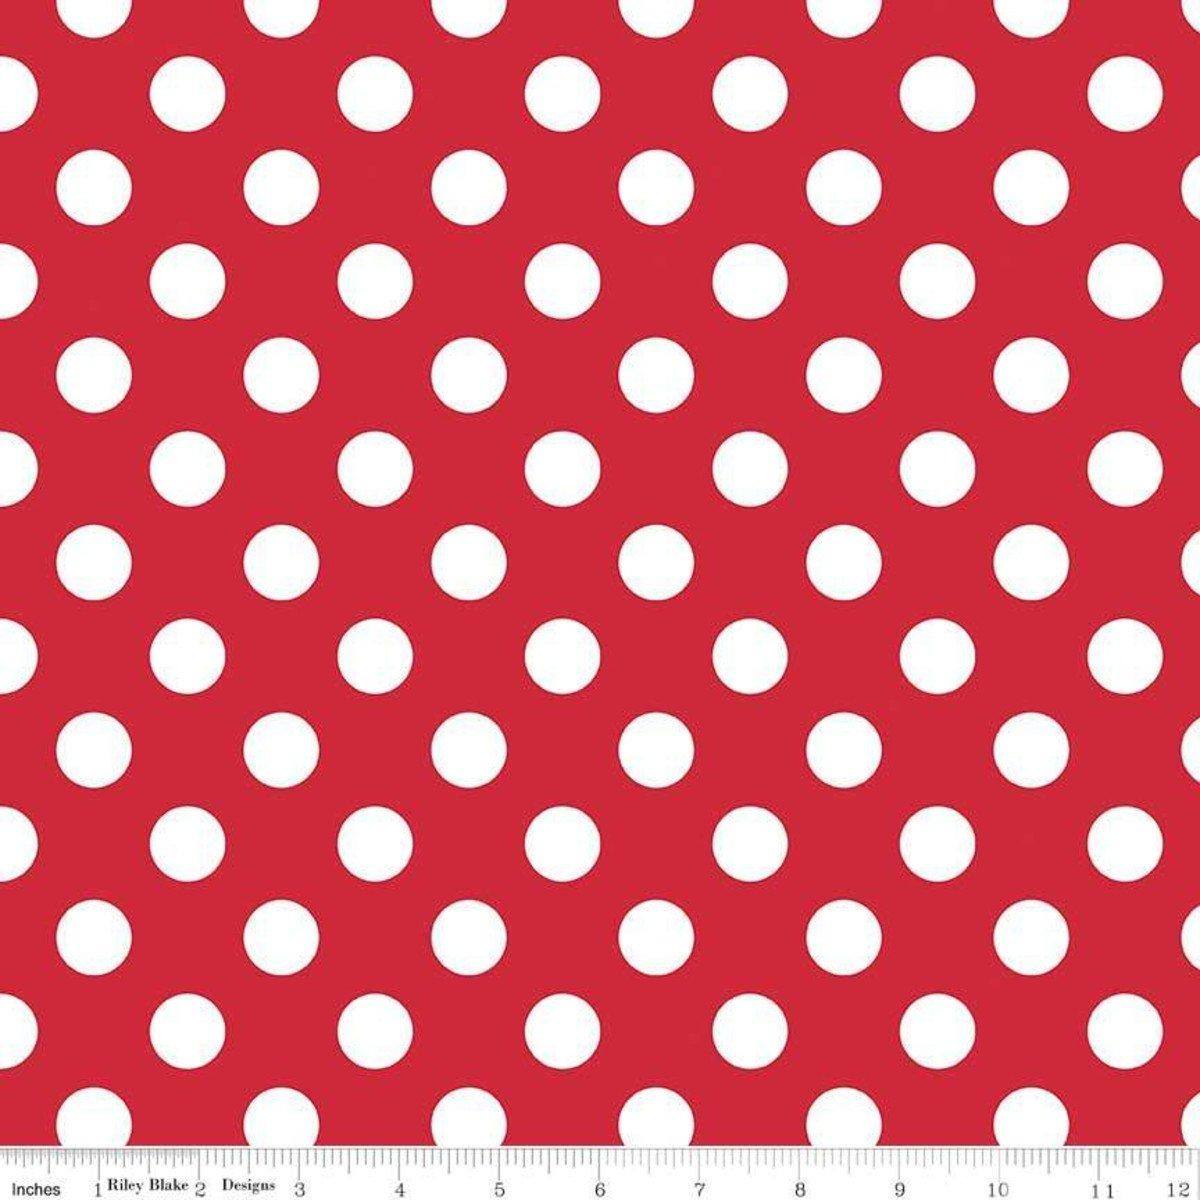 Cotton Basics Medium Dots - Red 360-80